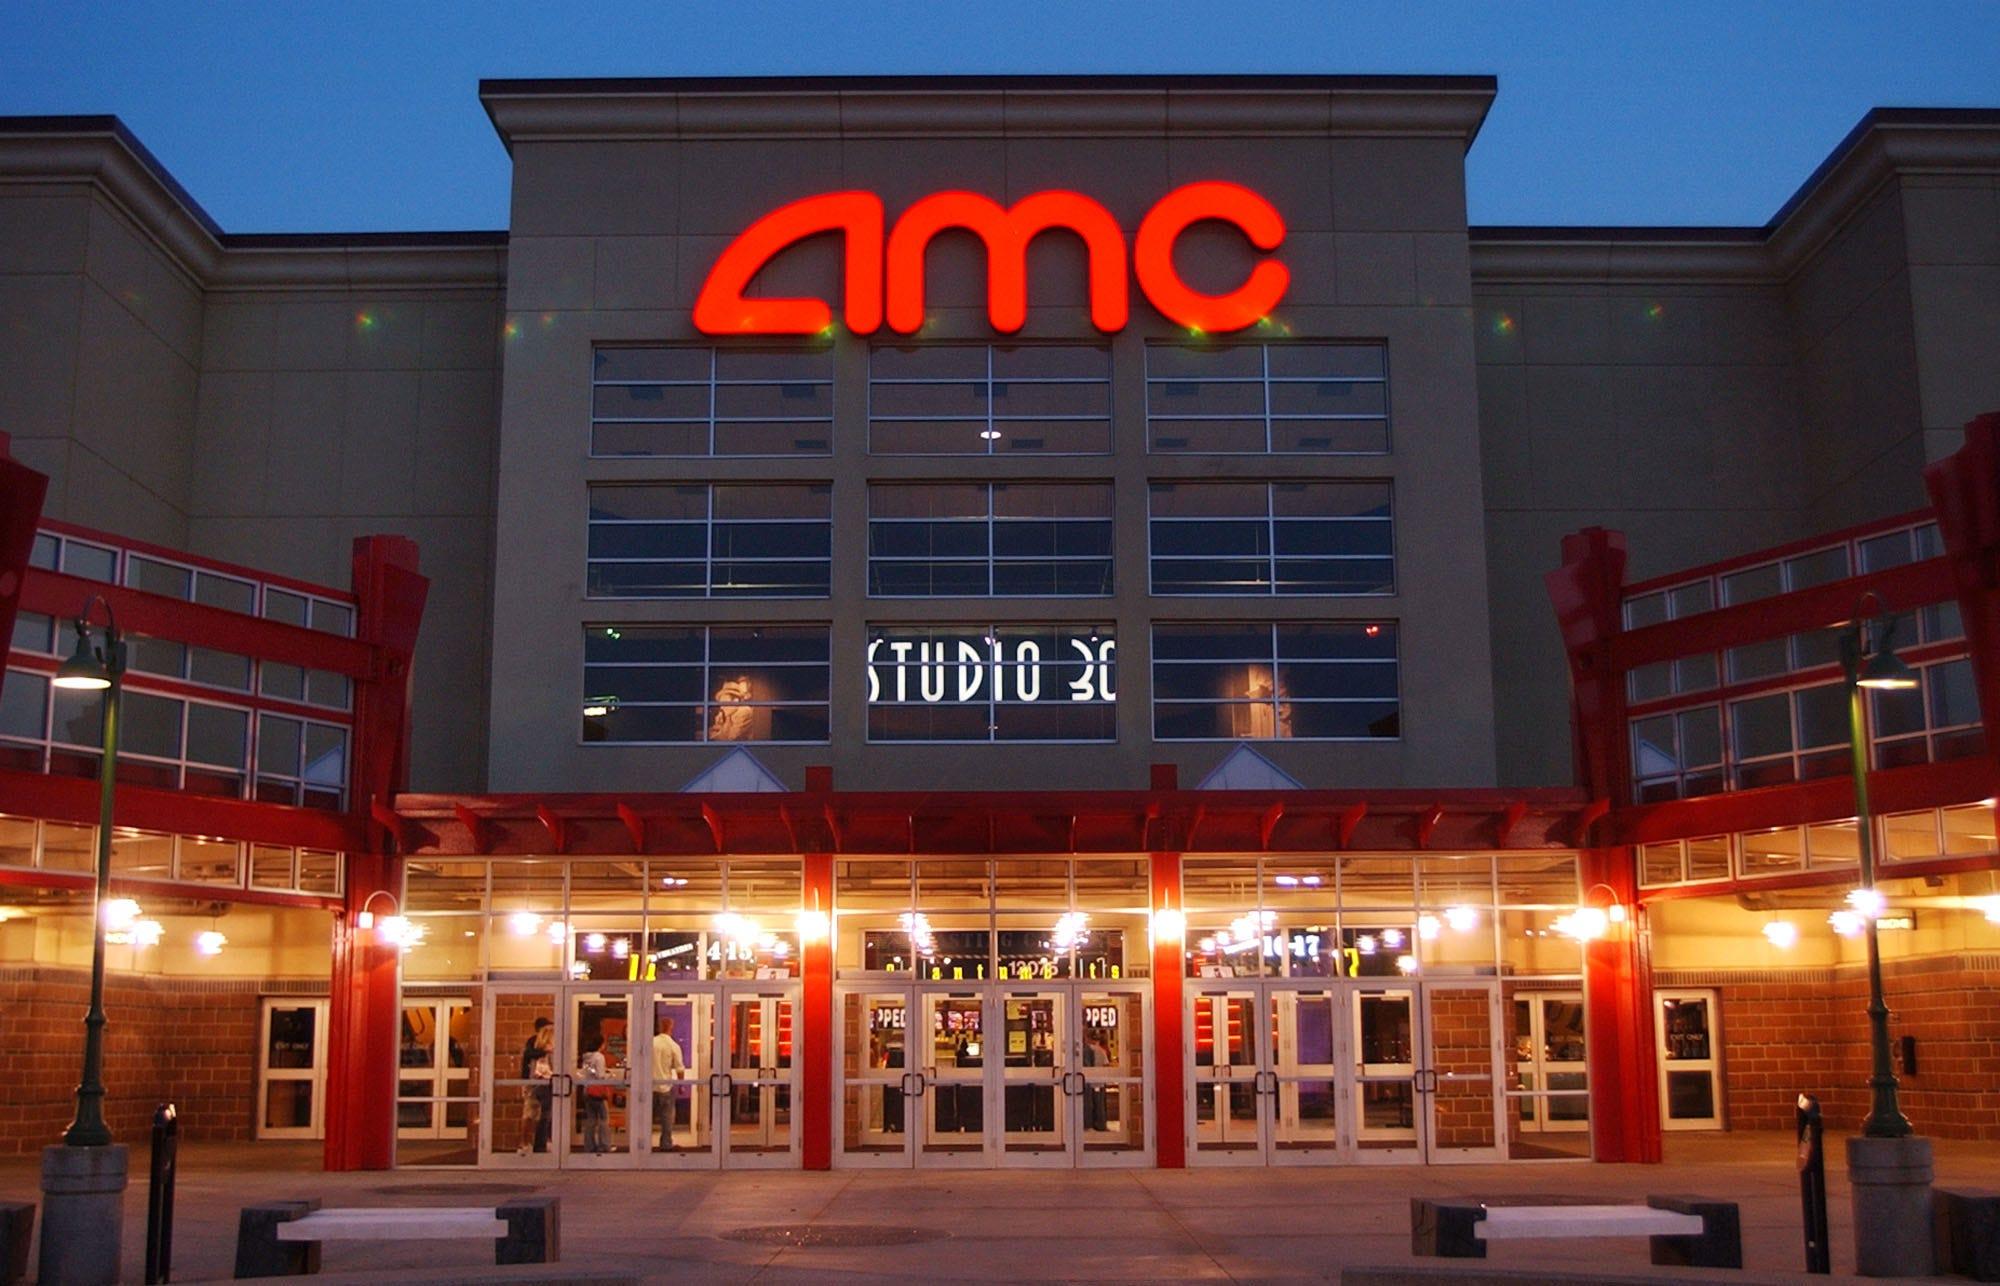 Statesboro cinema 9